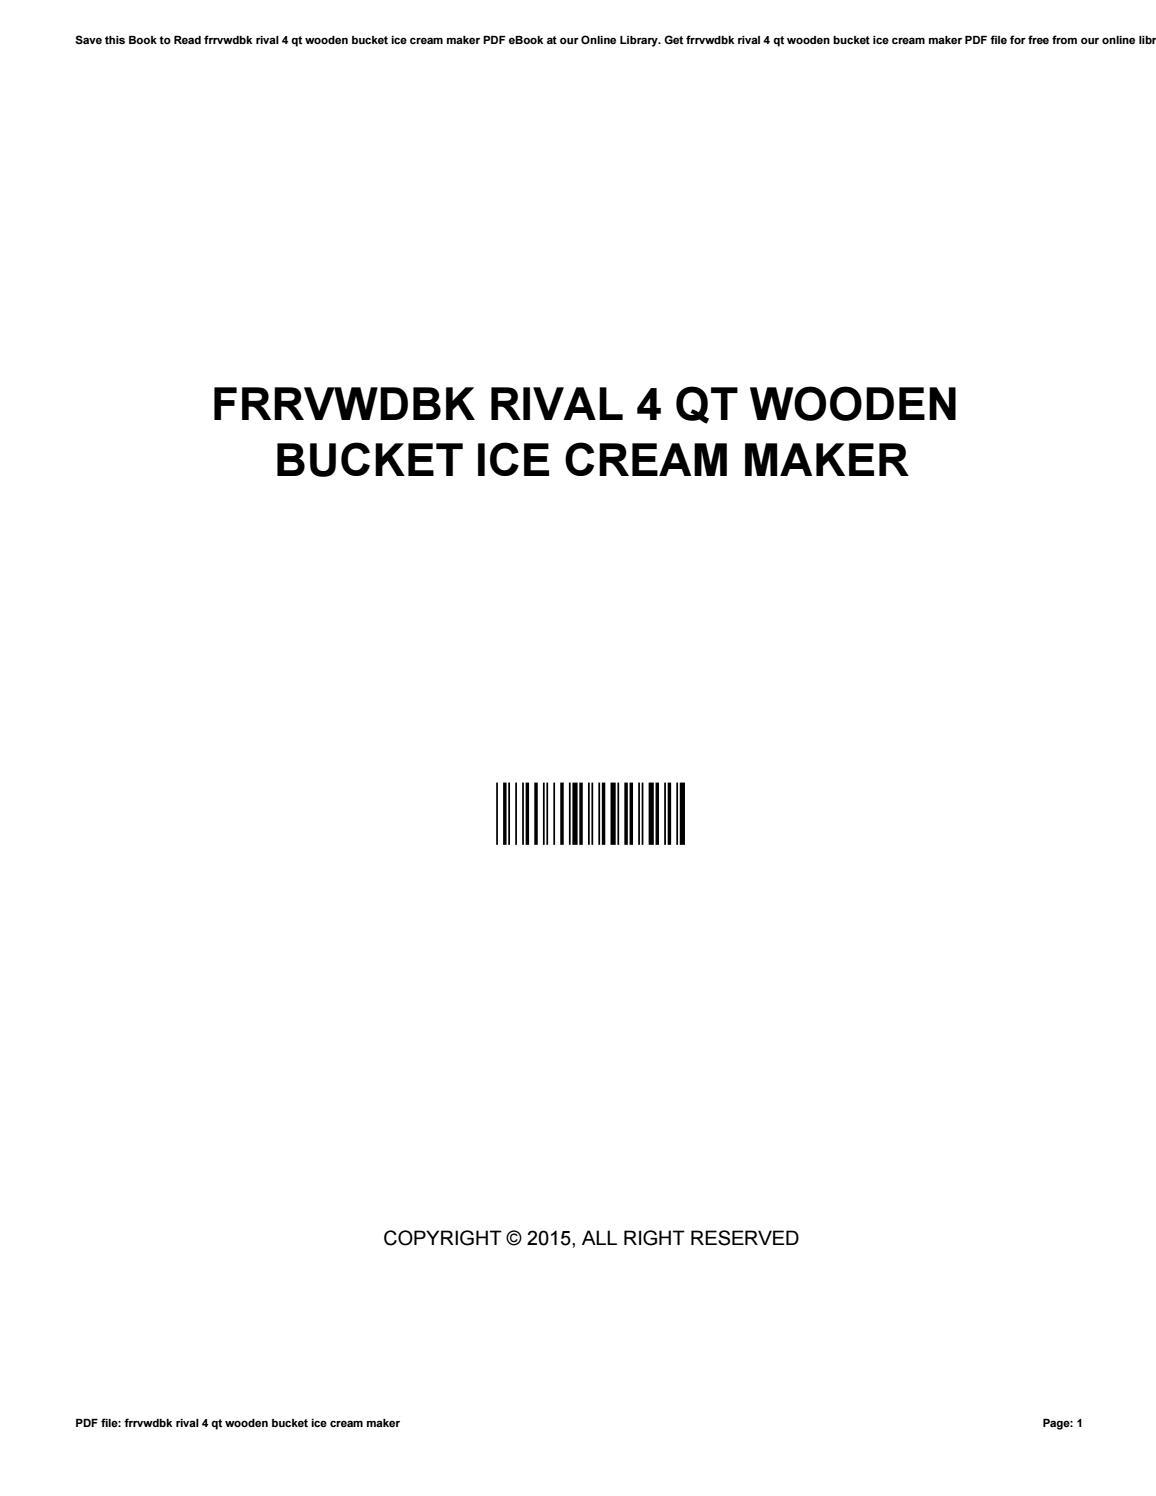 Frrvwdbk rival 4 qt wooden bucket ice cream maker by t295 - issuu